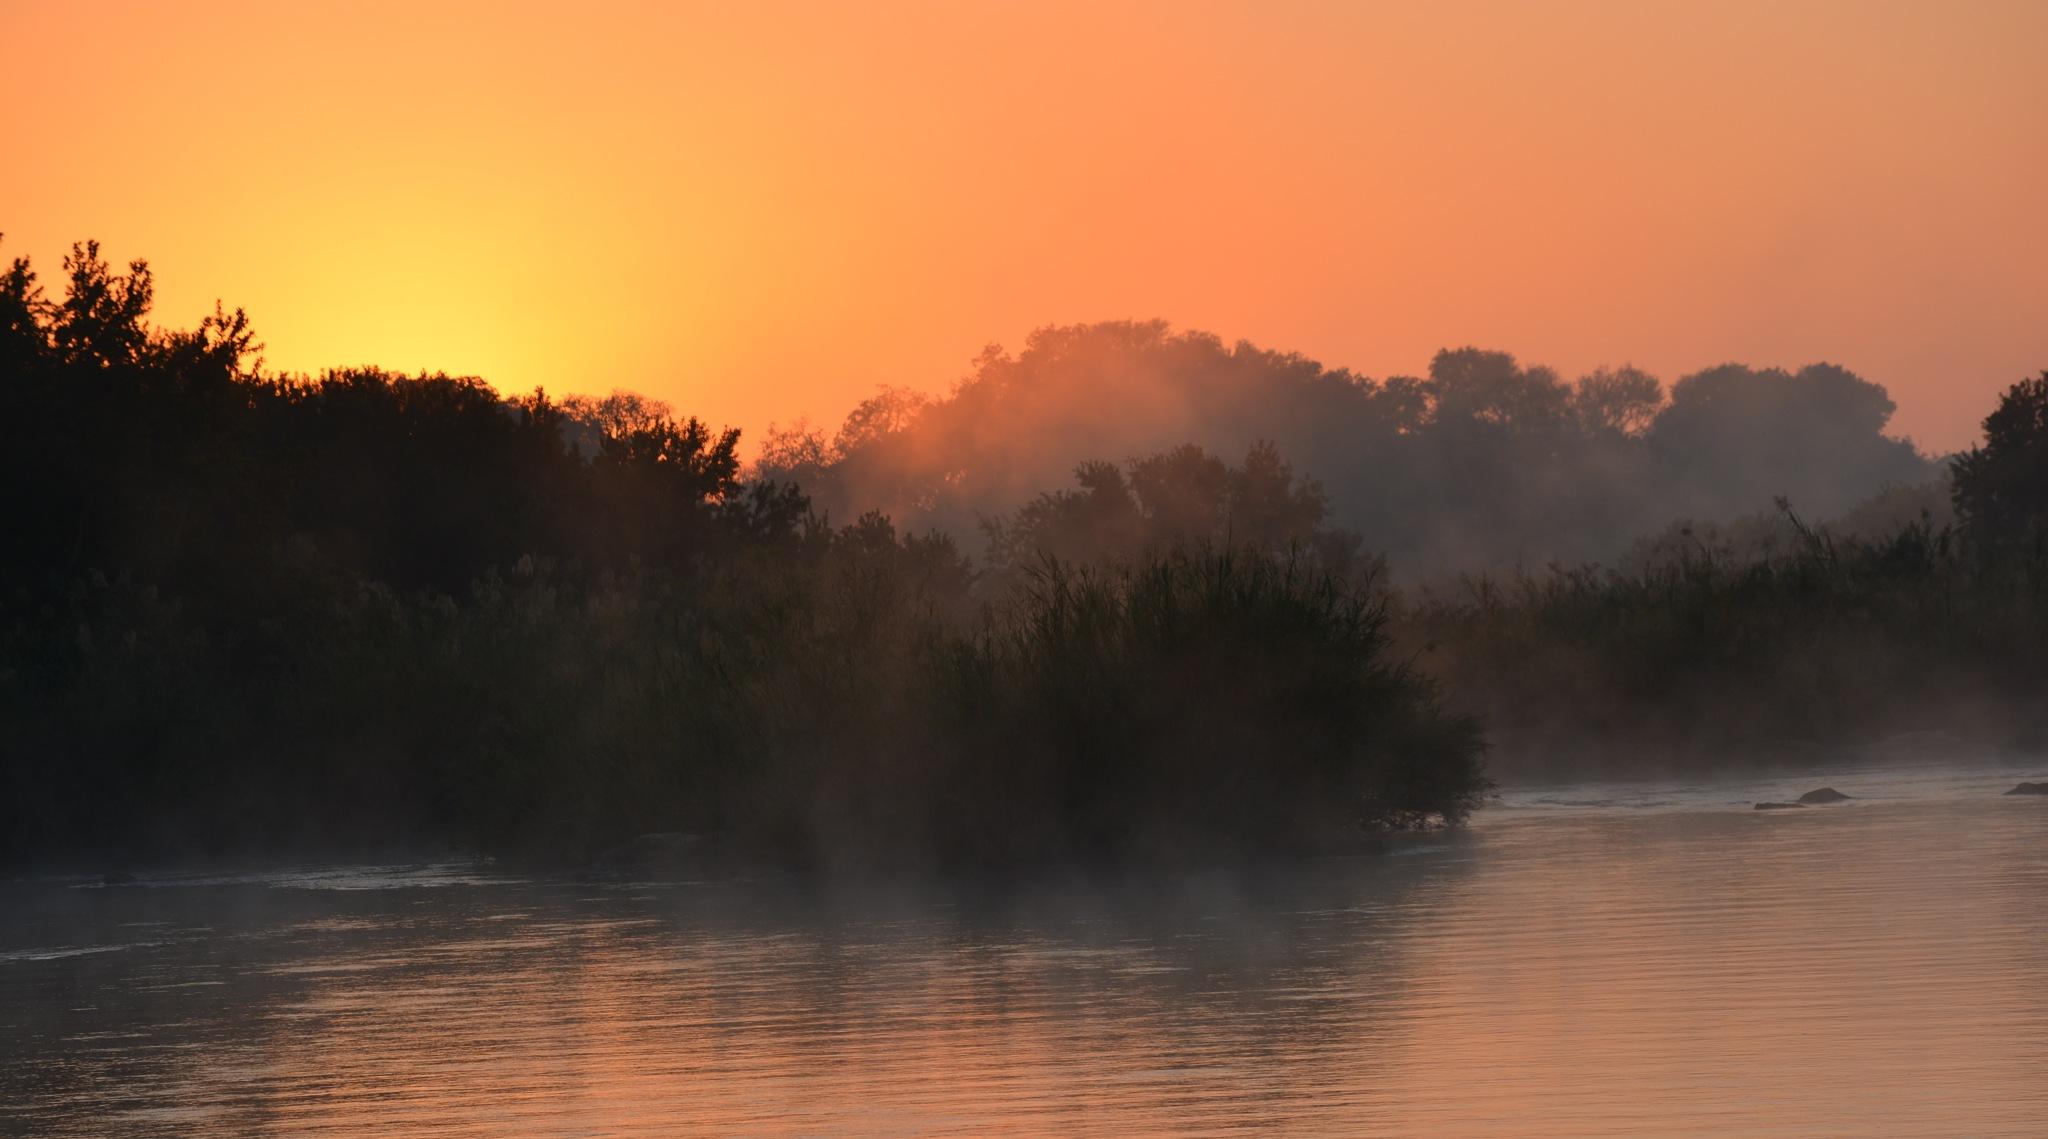 Africa Sunrise by godfreyanker